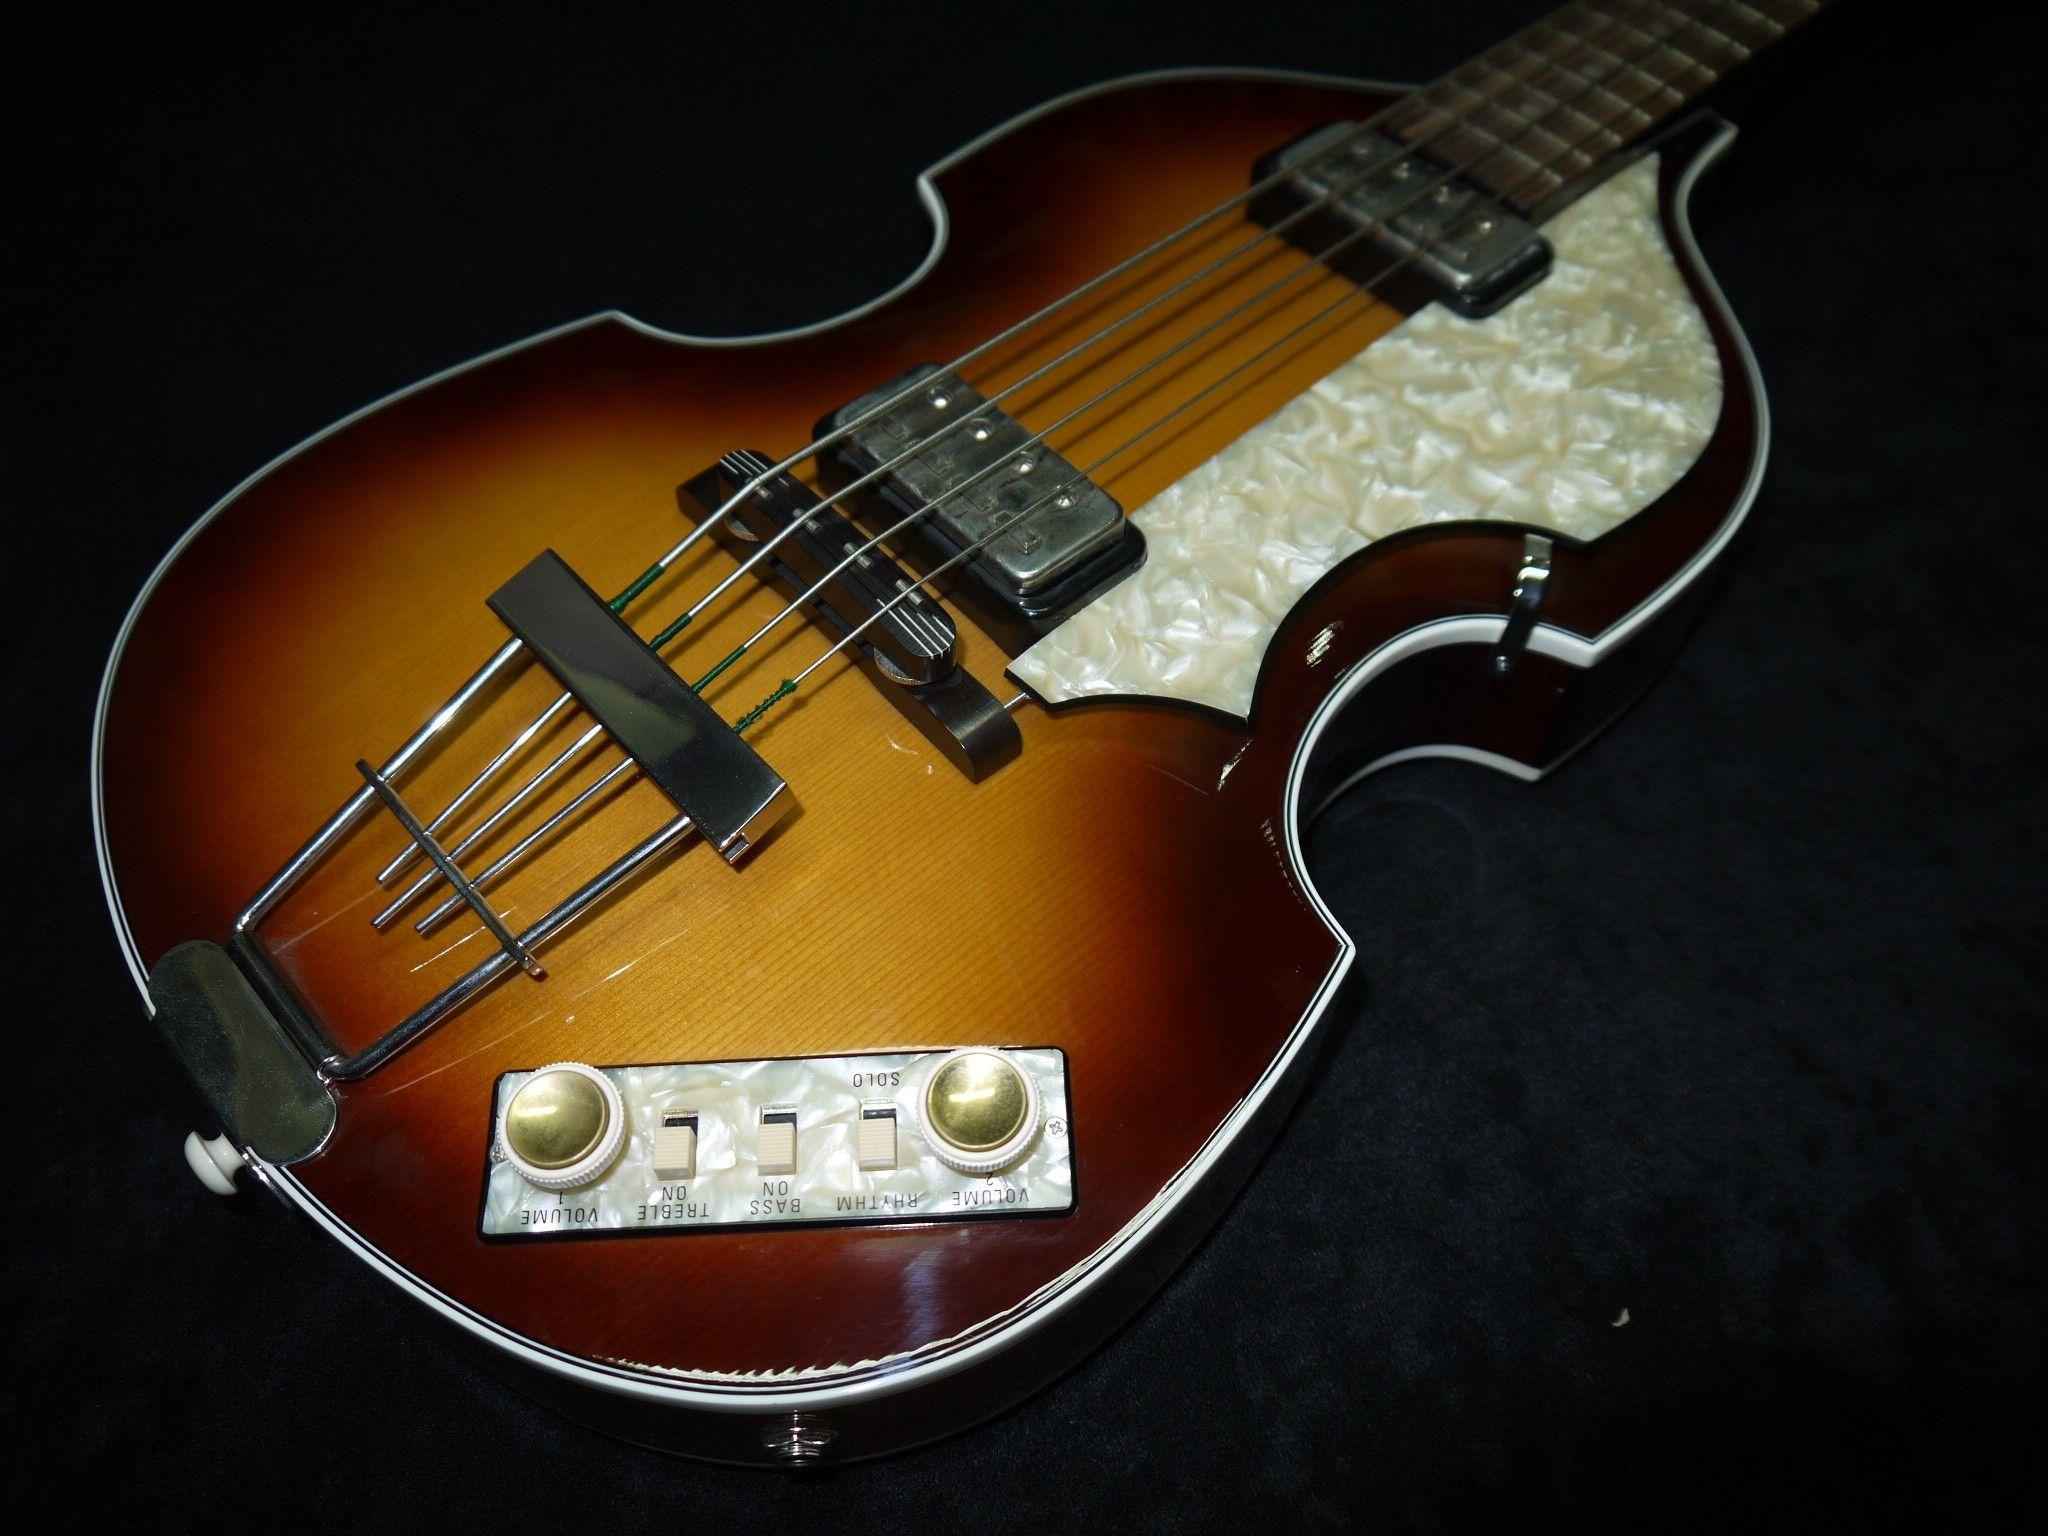 Hofner Violin Bass 1963 Reissue 2010 S Antique Brown Sunbrust Guitar For Sale Sound Affects Guitar Bass Guitars For Sale